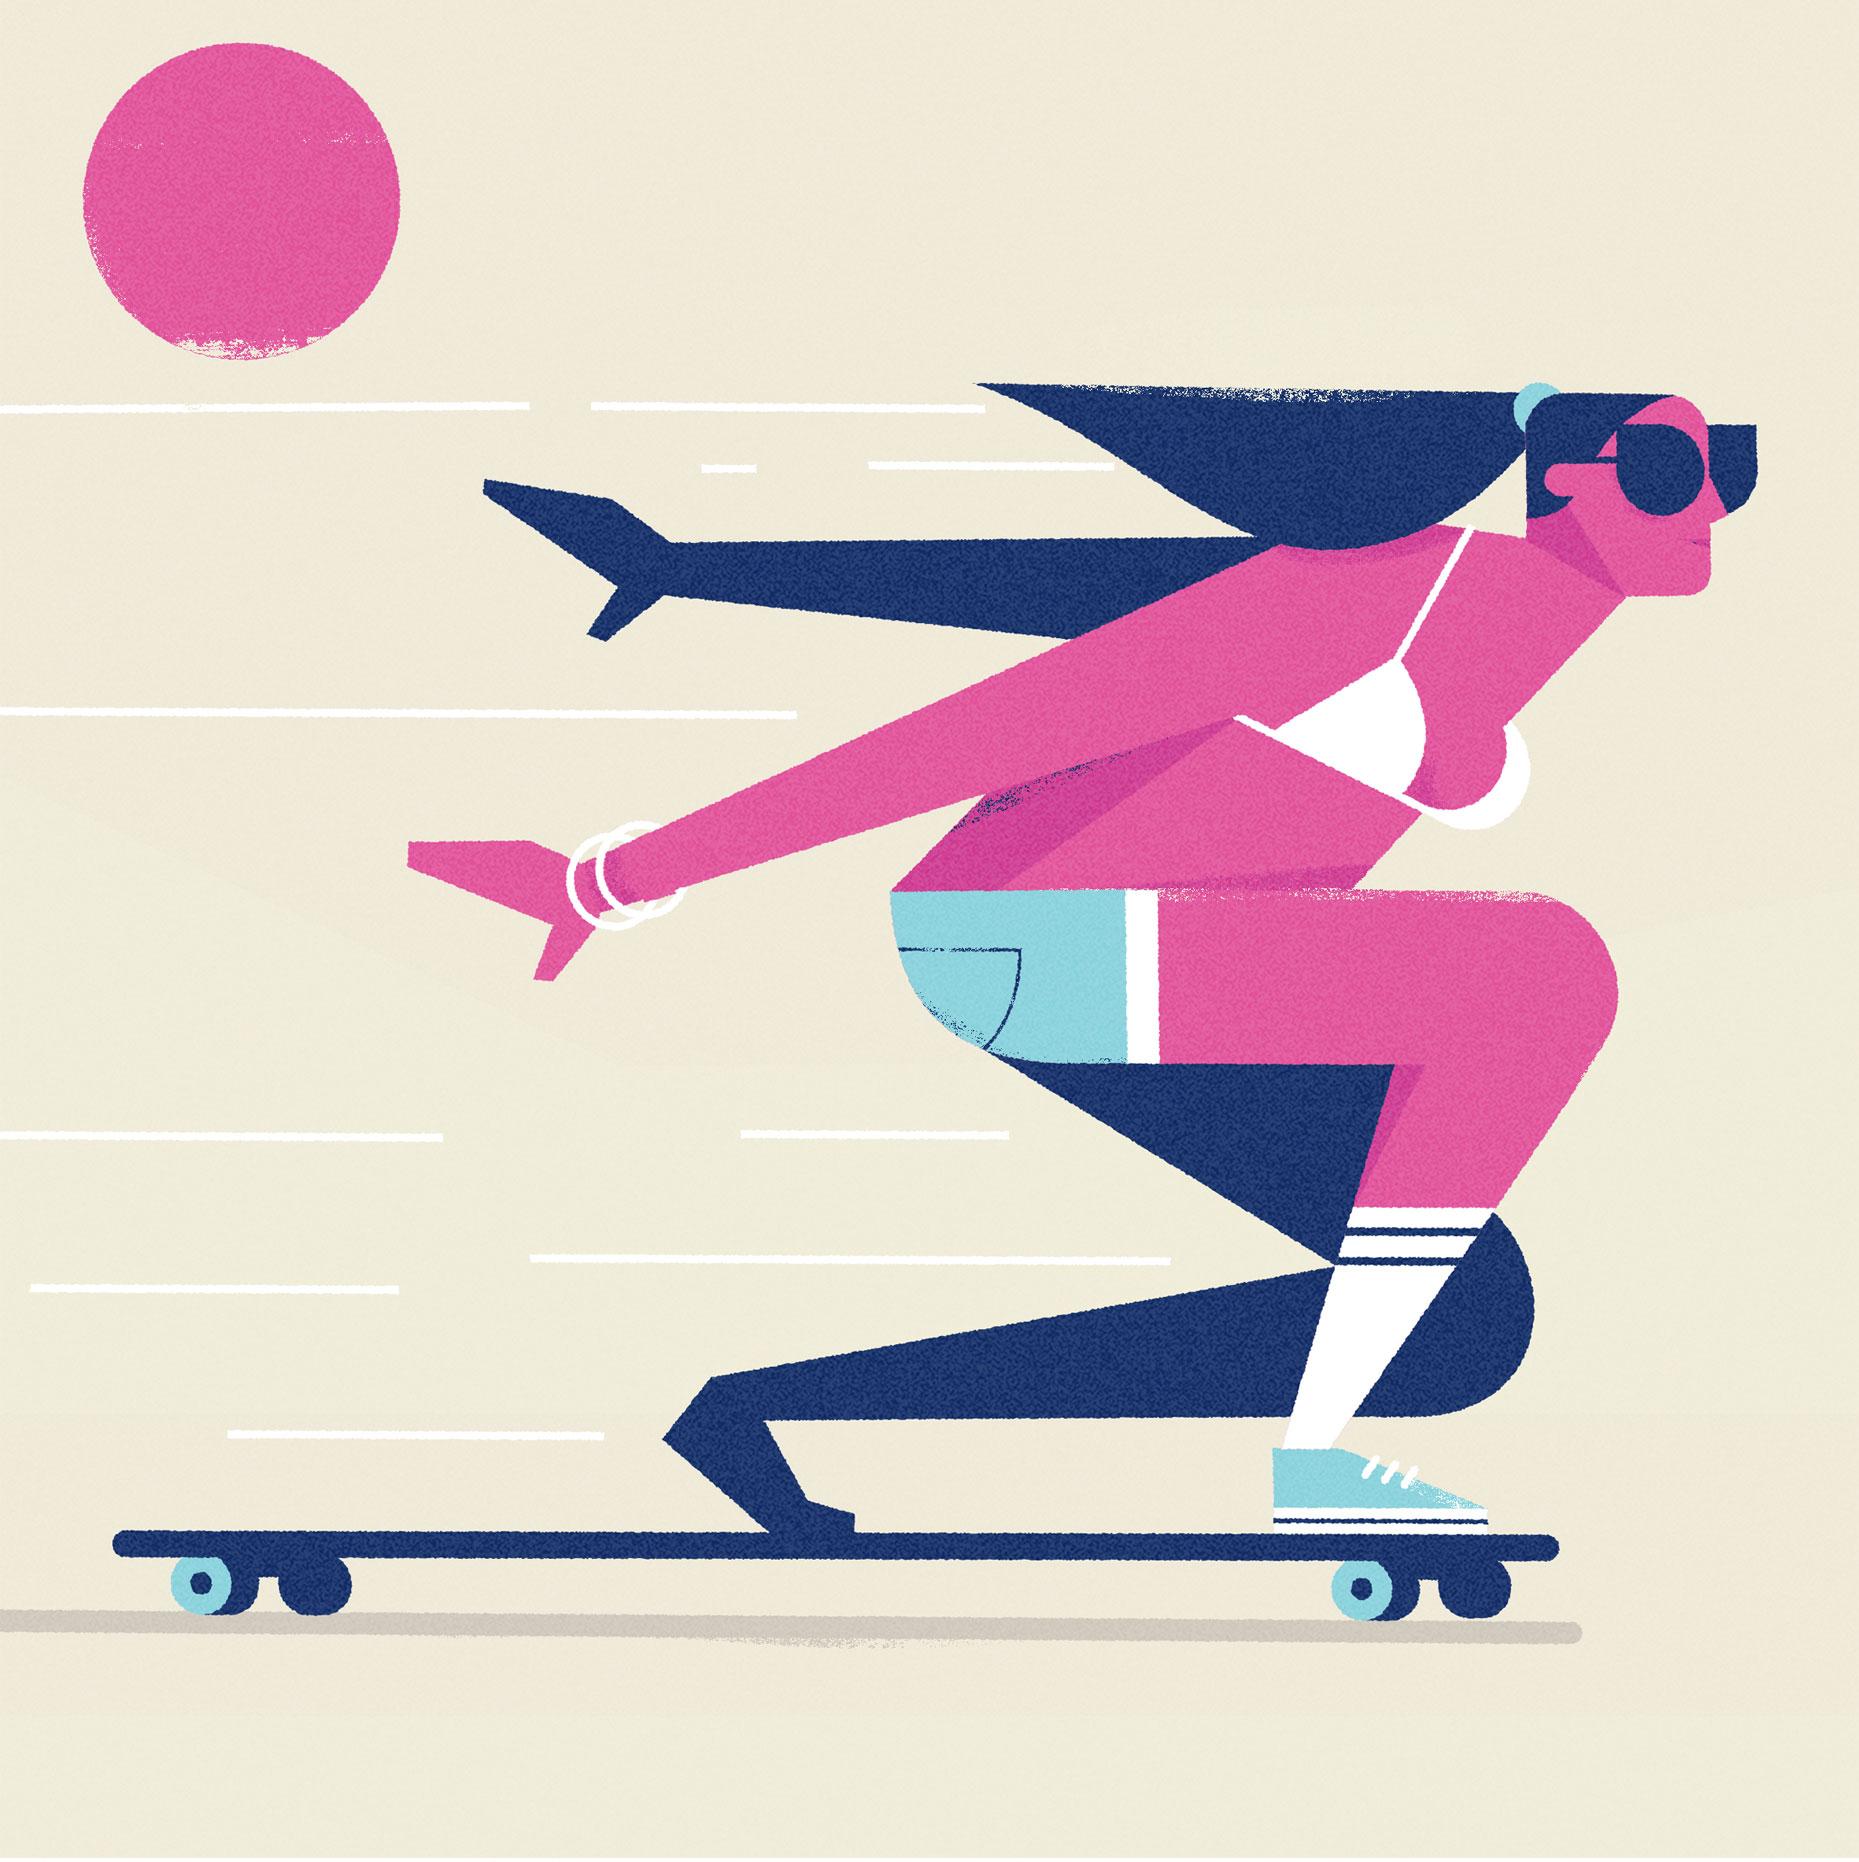 dale edwin murray freelance illustrator pitch character development illustration